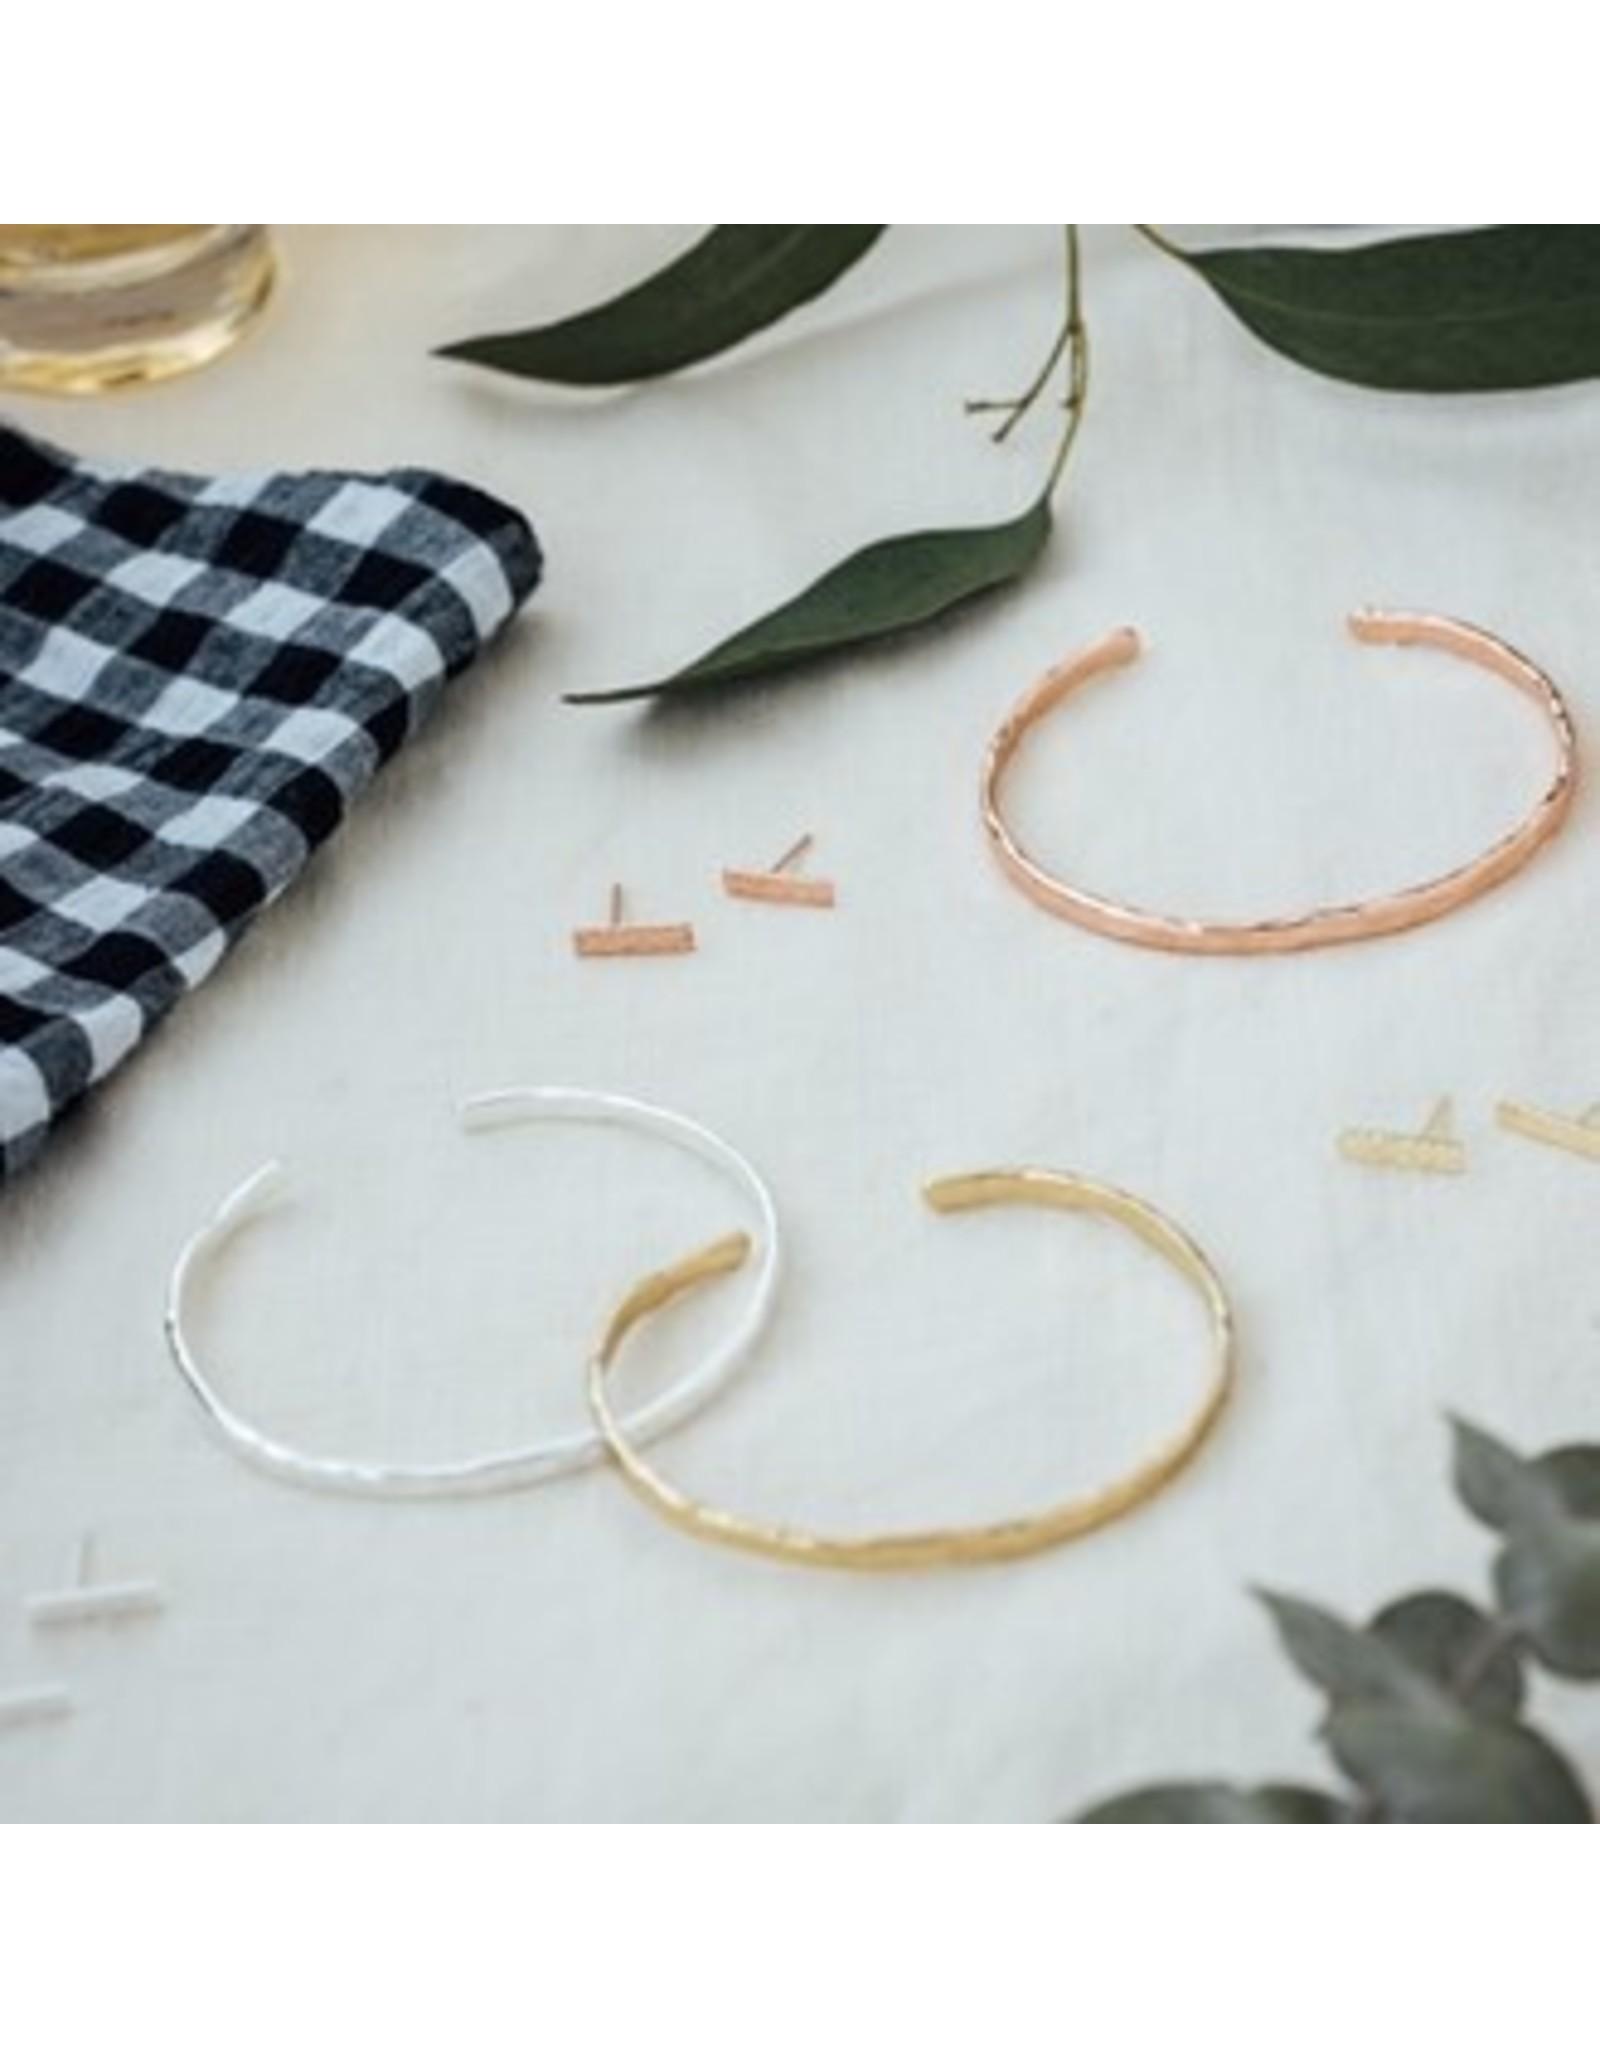 Glee jewelry Facile Cuff/Gold